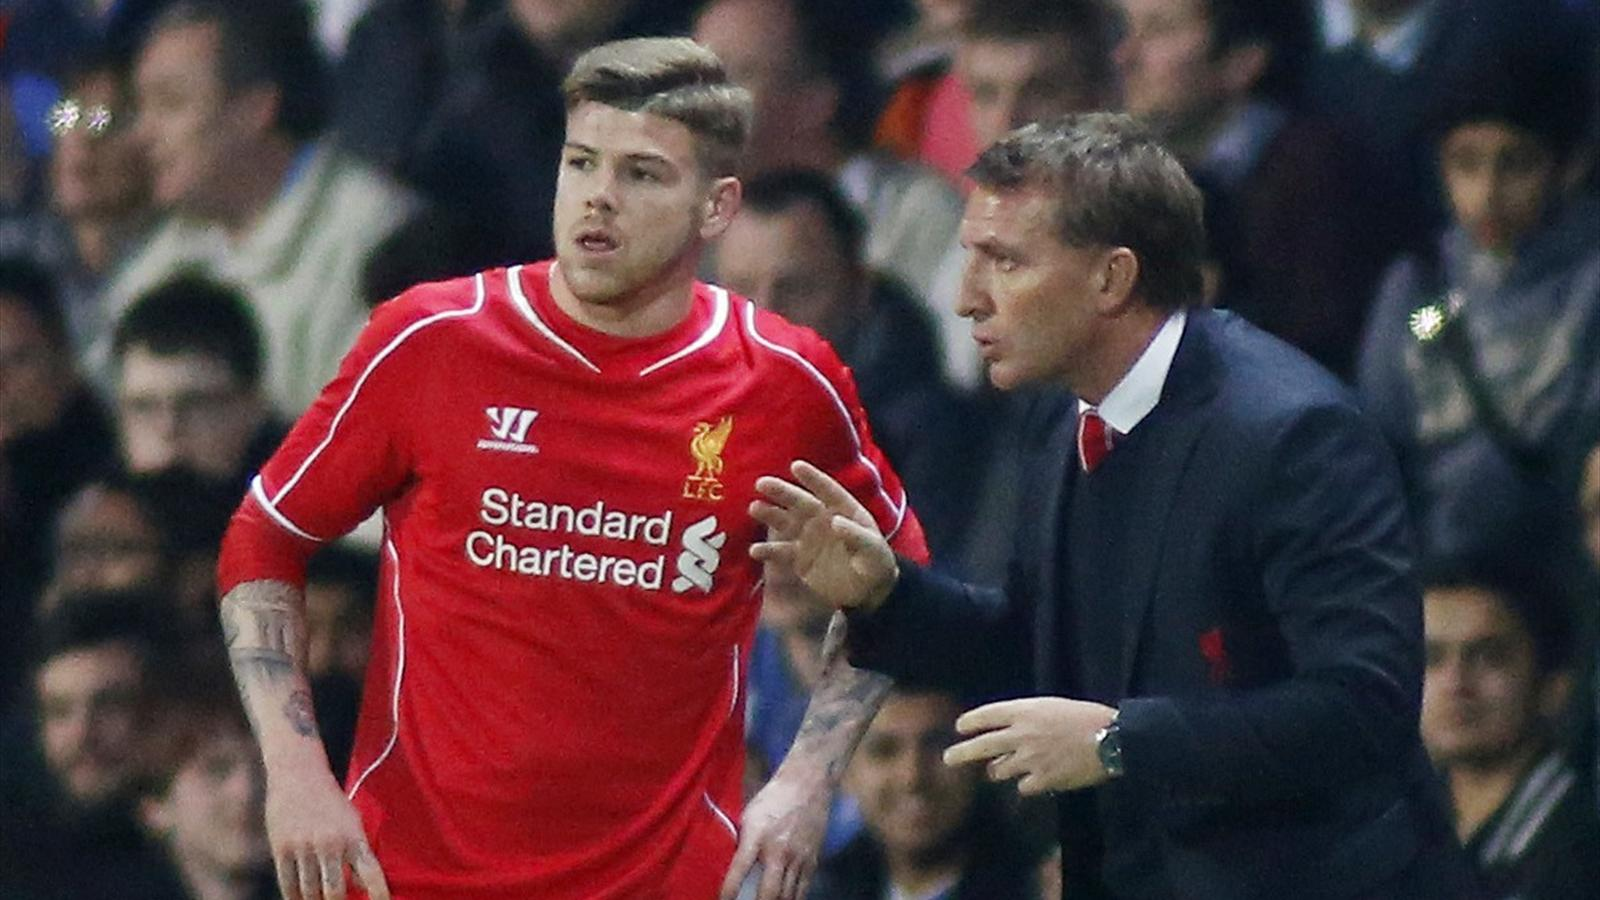 Liverpool's Alberto Moreno talks to manager Brendan Rodgers